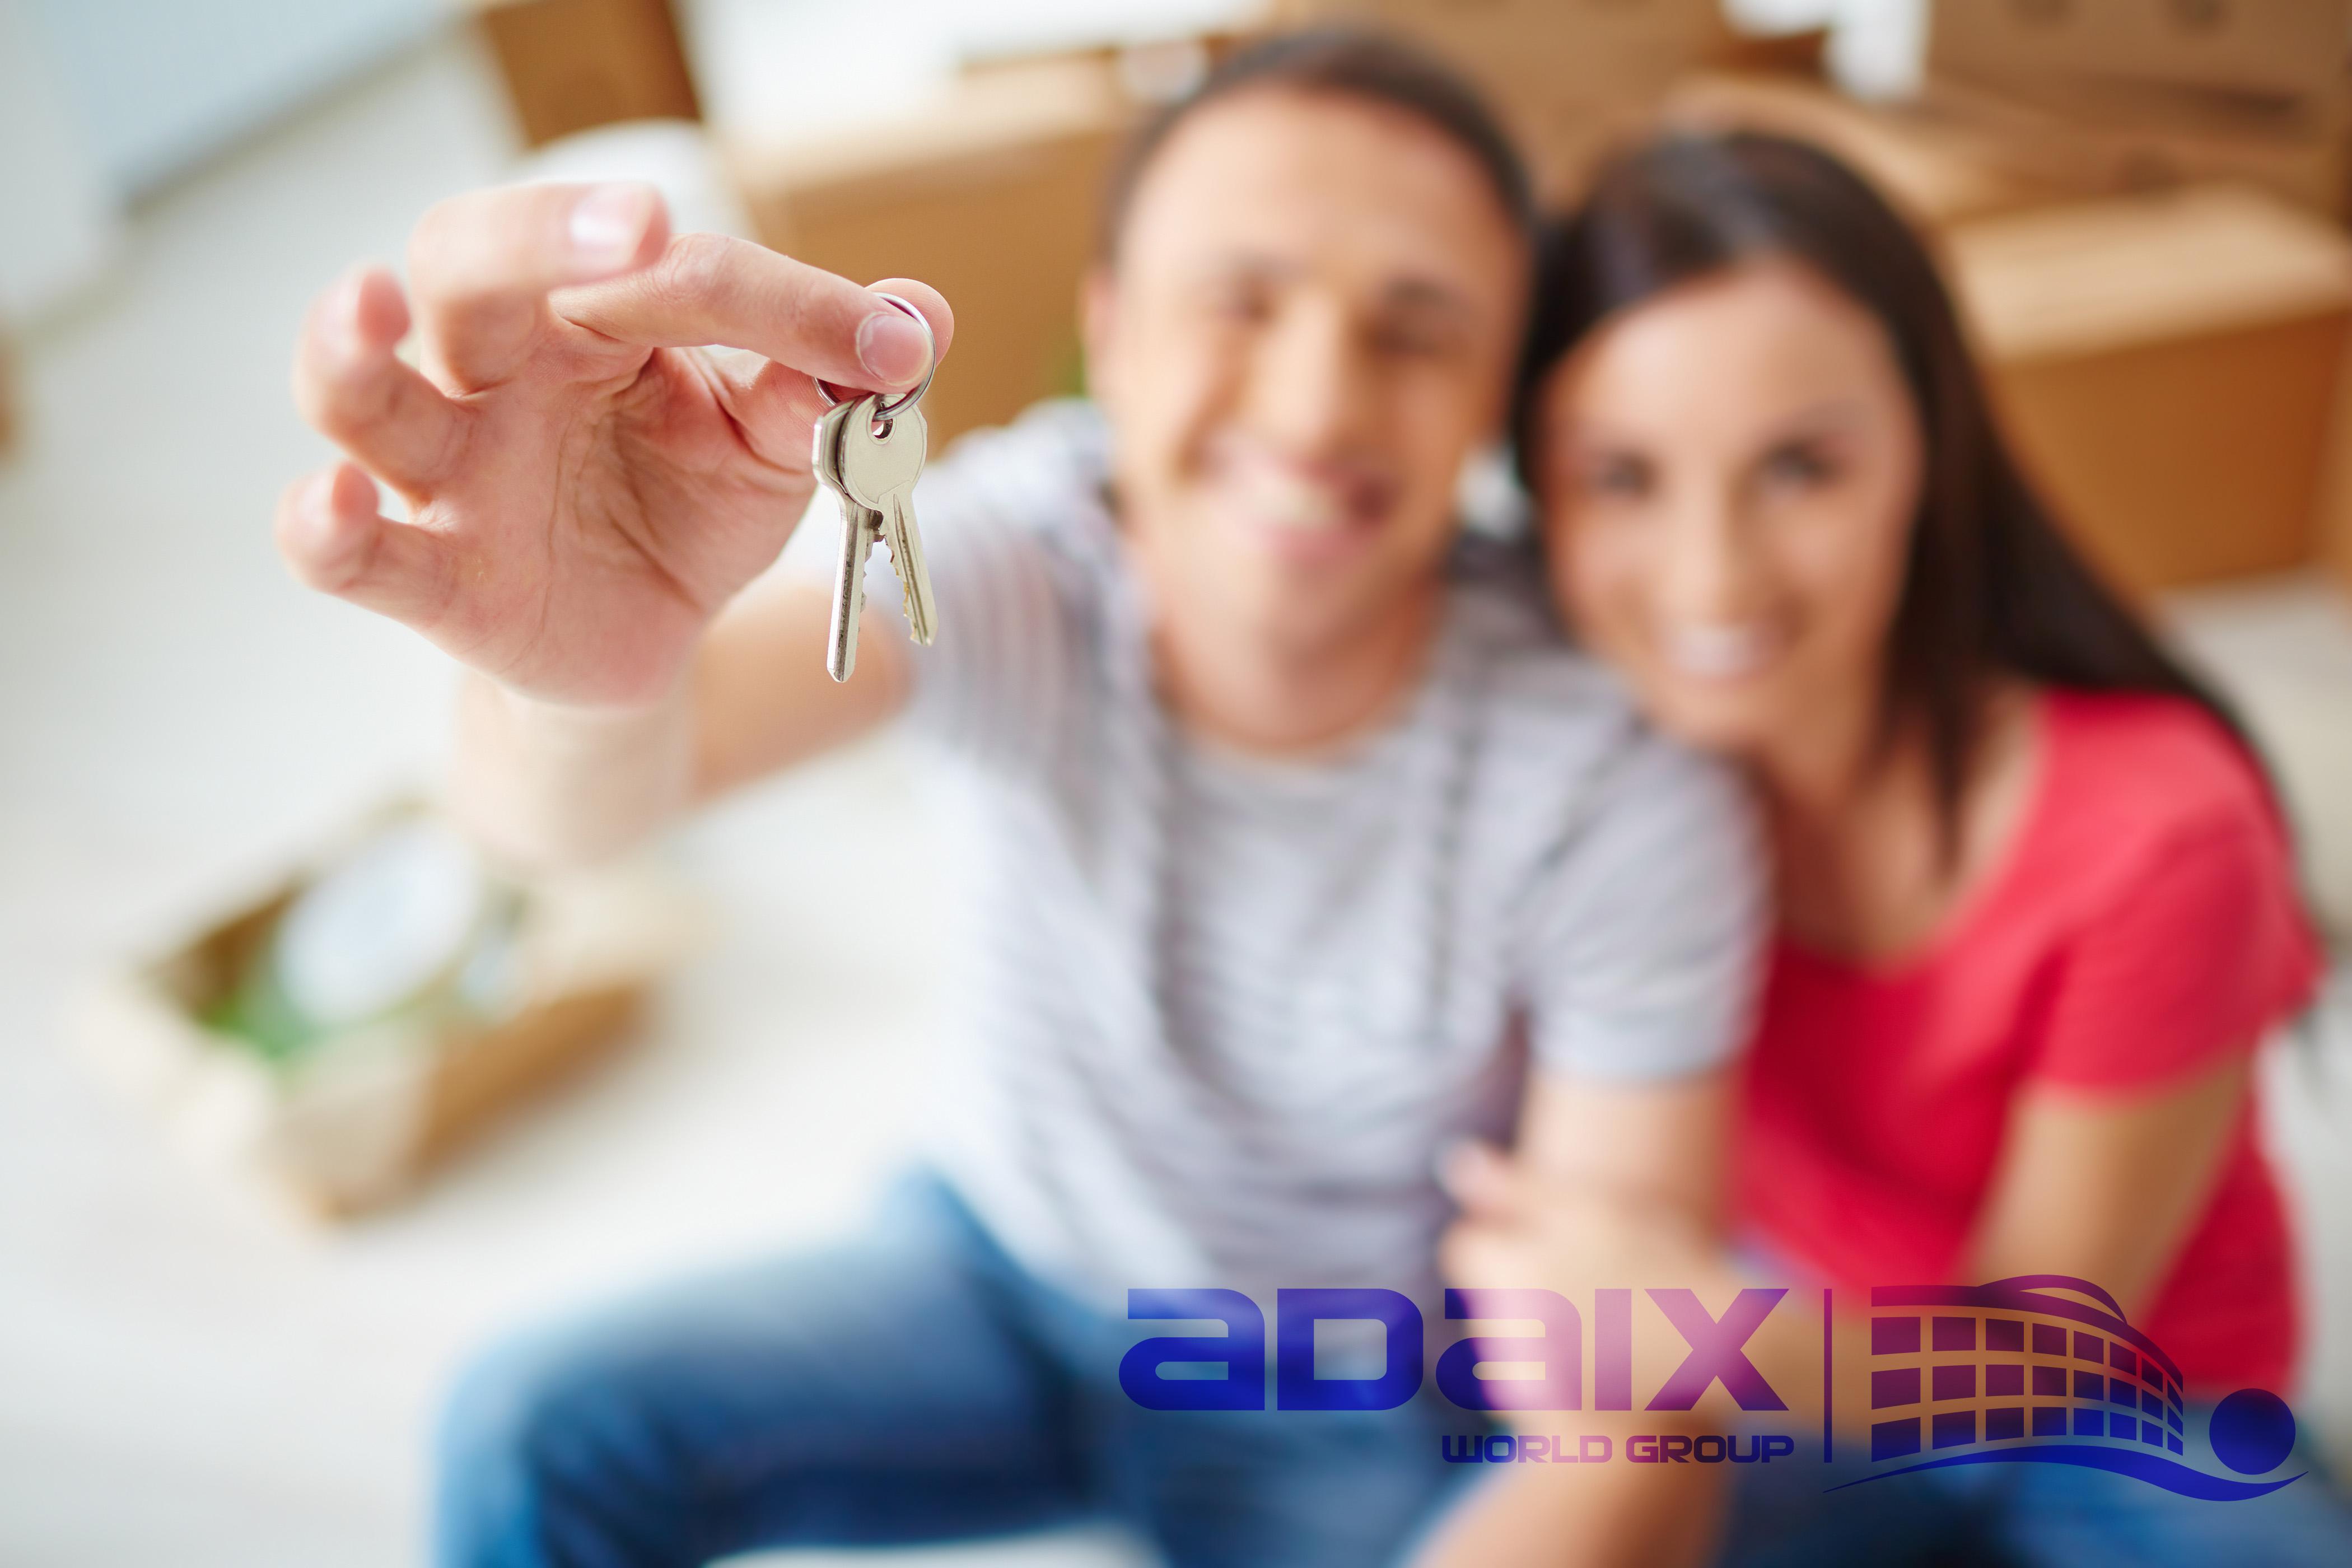 Análisis de perfiles de compradores comunes